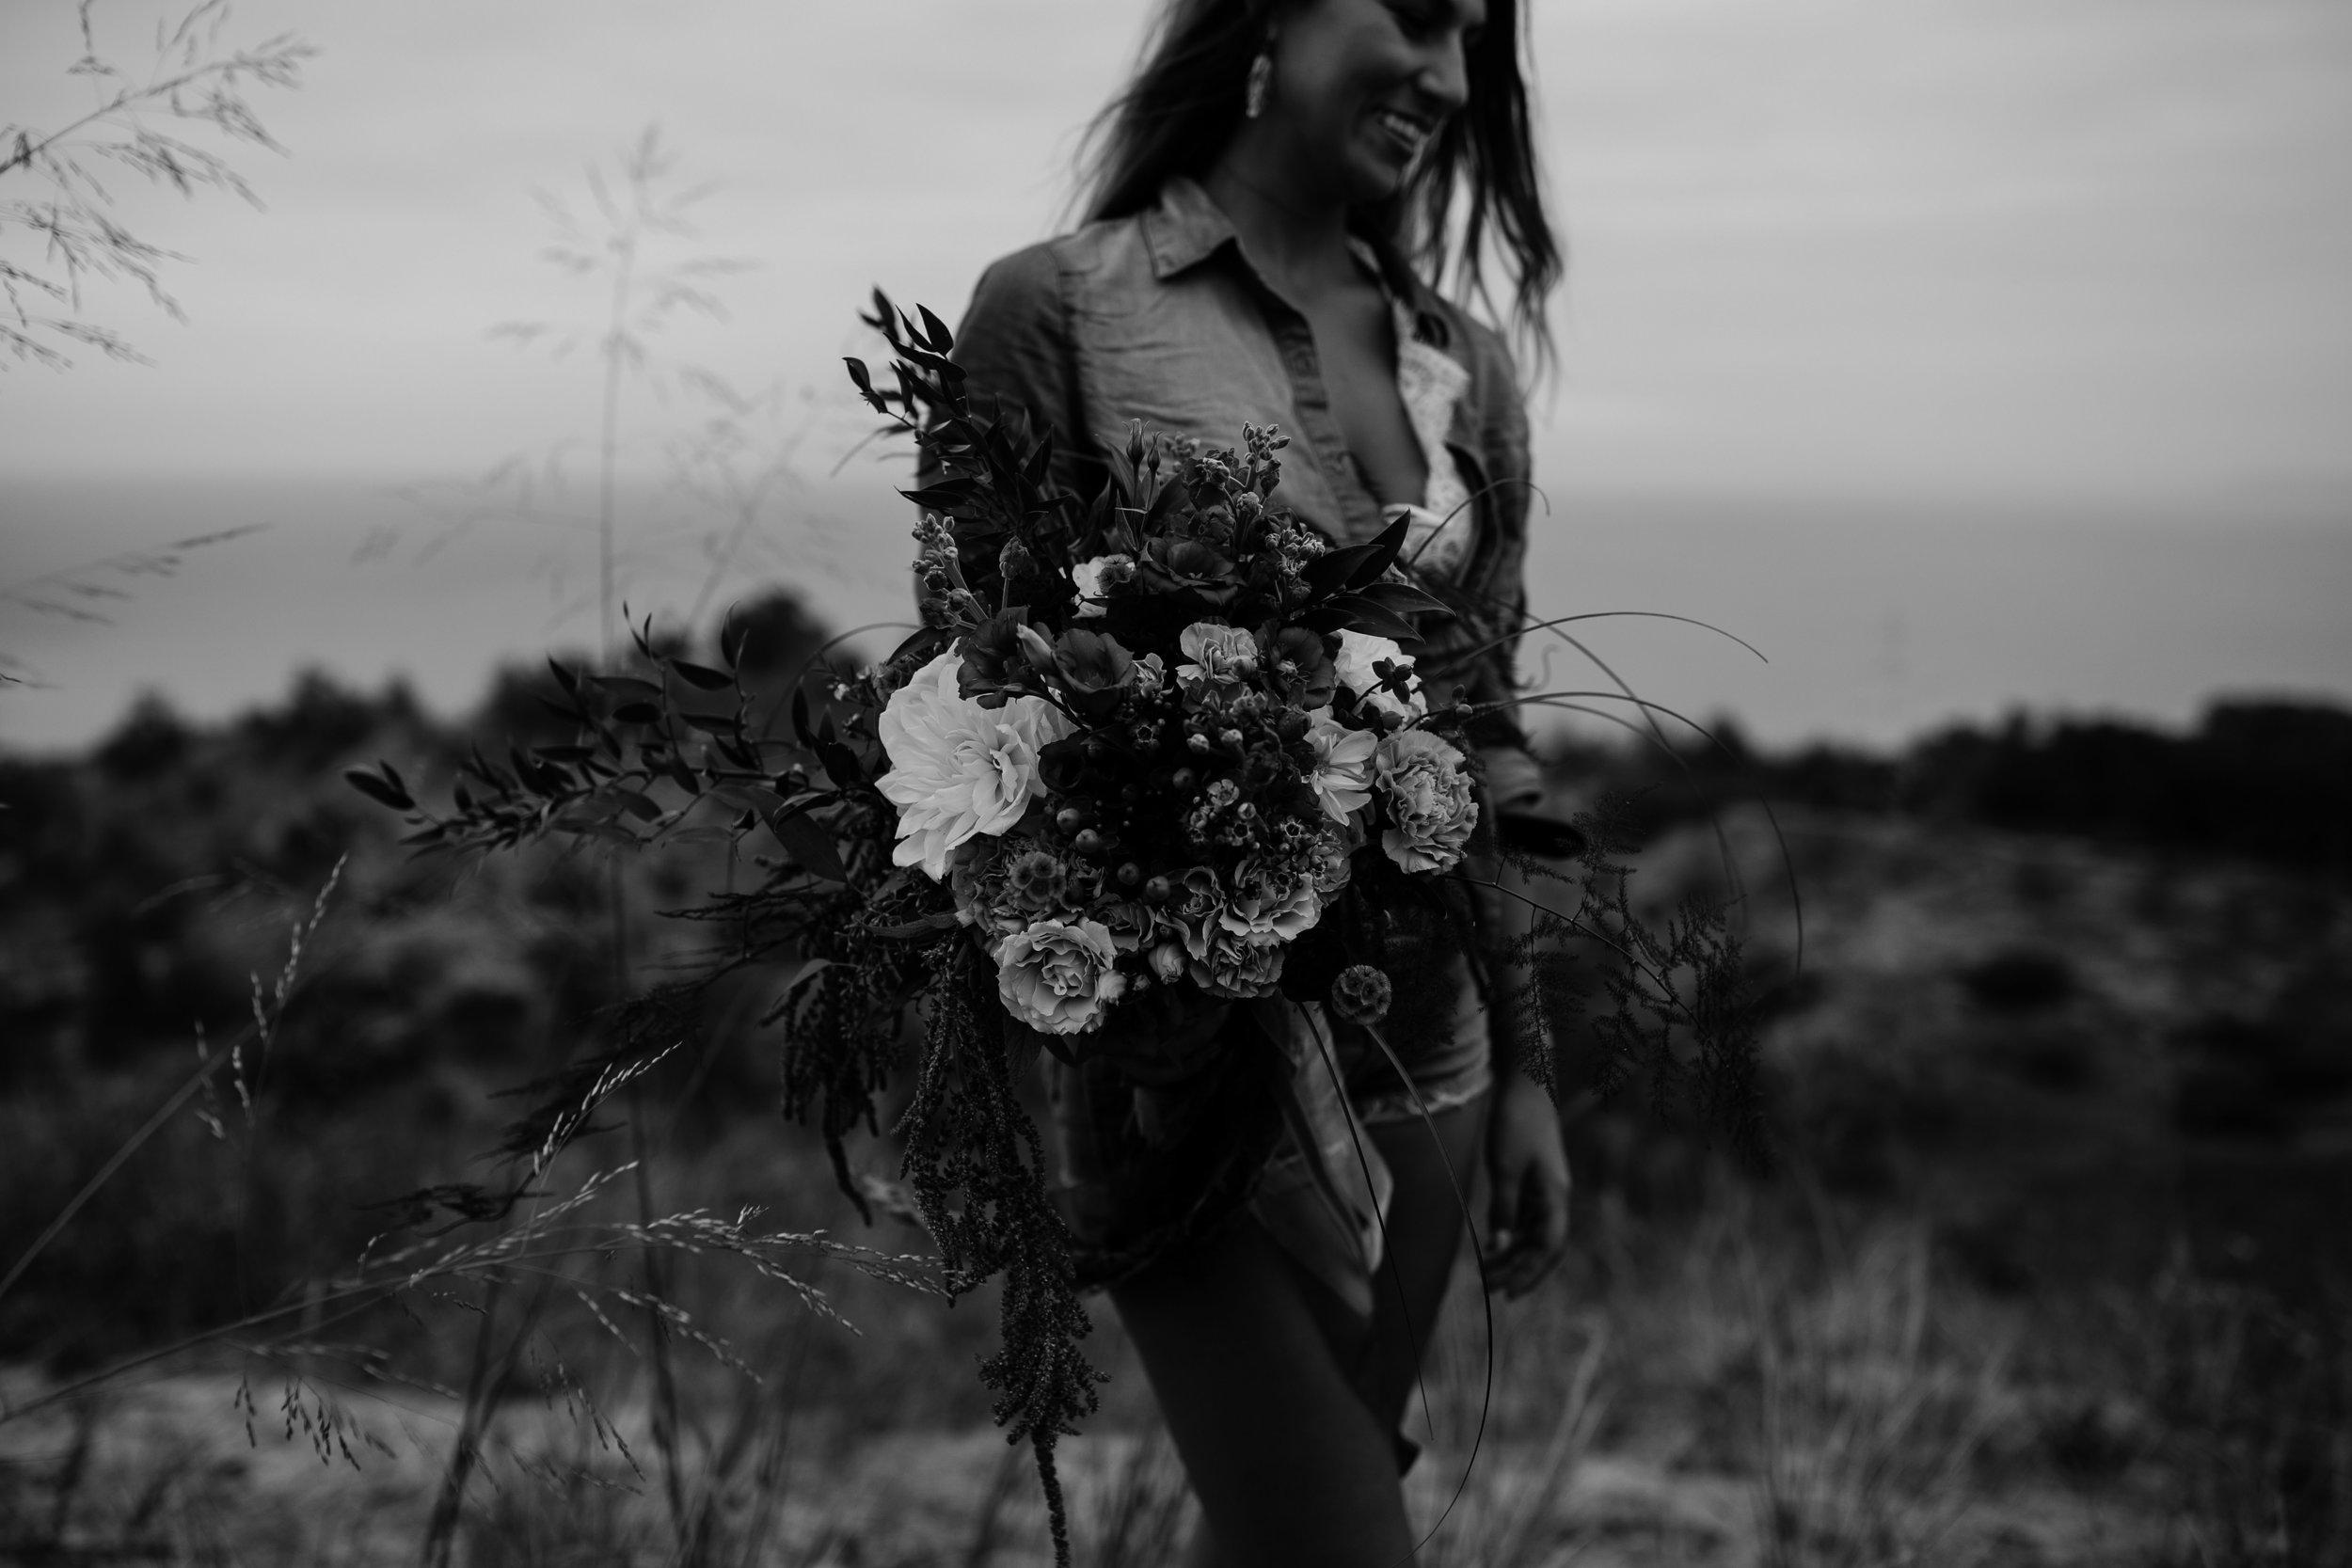 michigan-emotive-photographer-moonlight-elopement-mariha-hunter-44.jpg